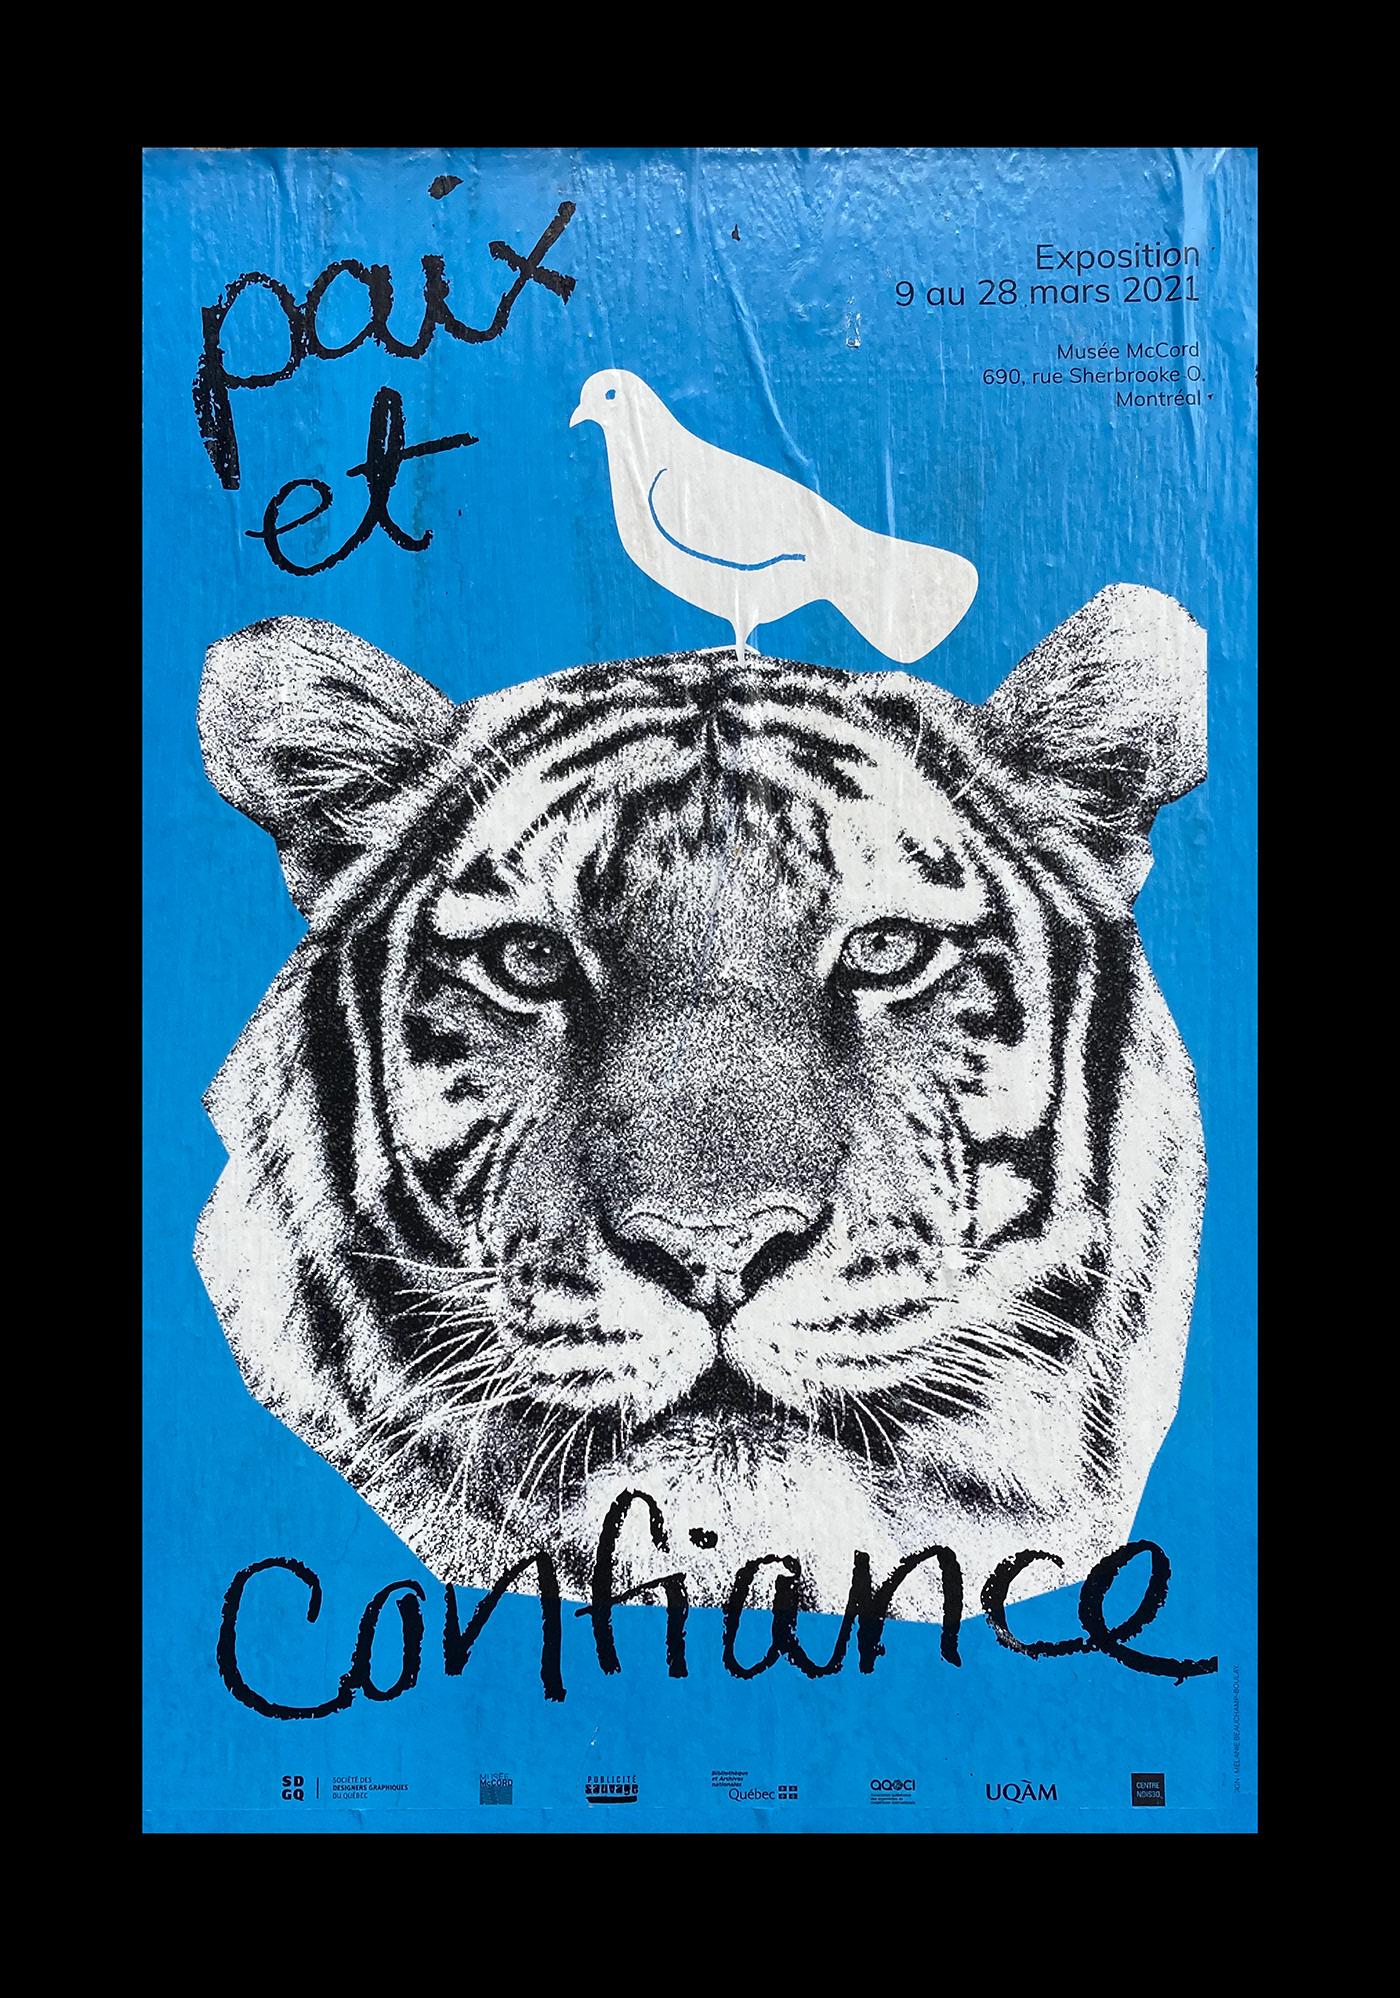 affiche design graphic graphique ILLUSTRATION  Montreal peace Photography  poster print